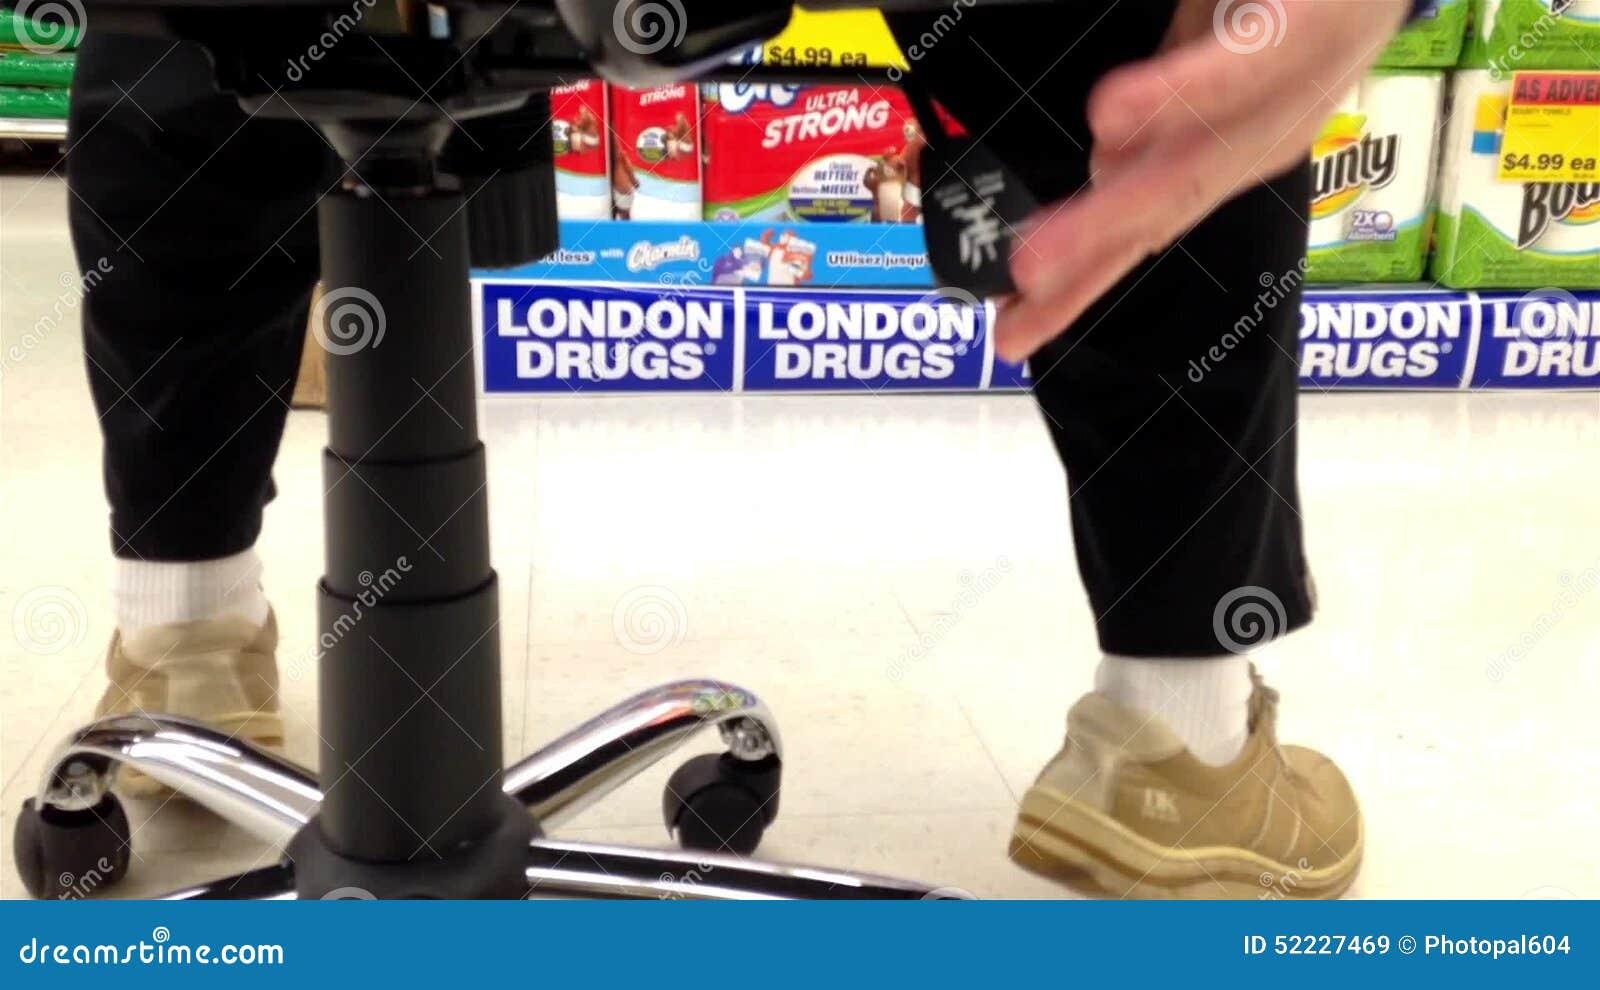 Download london drugs driver license